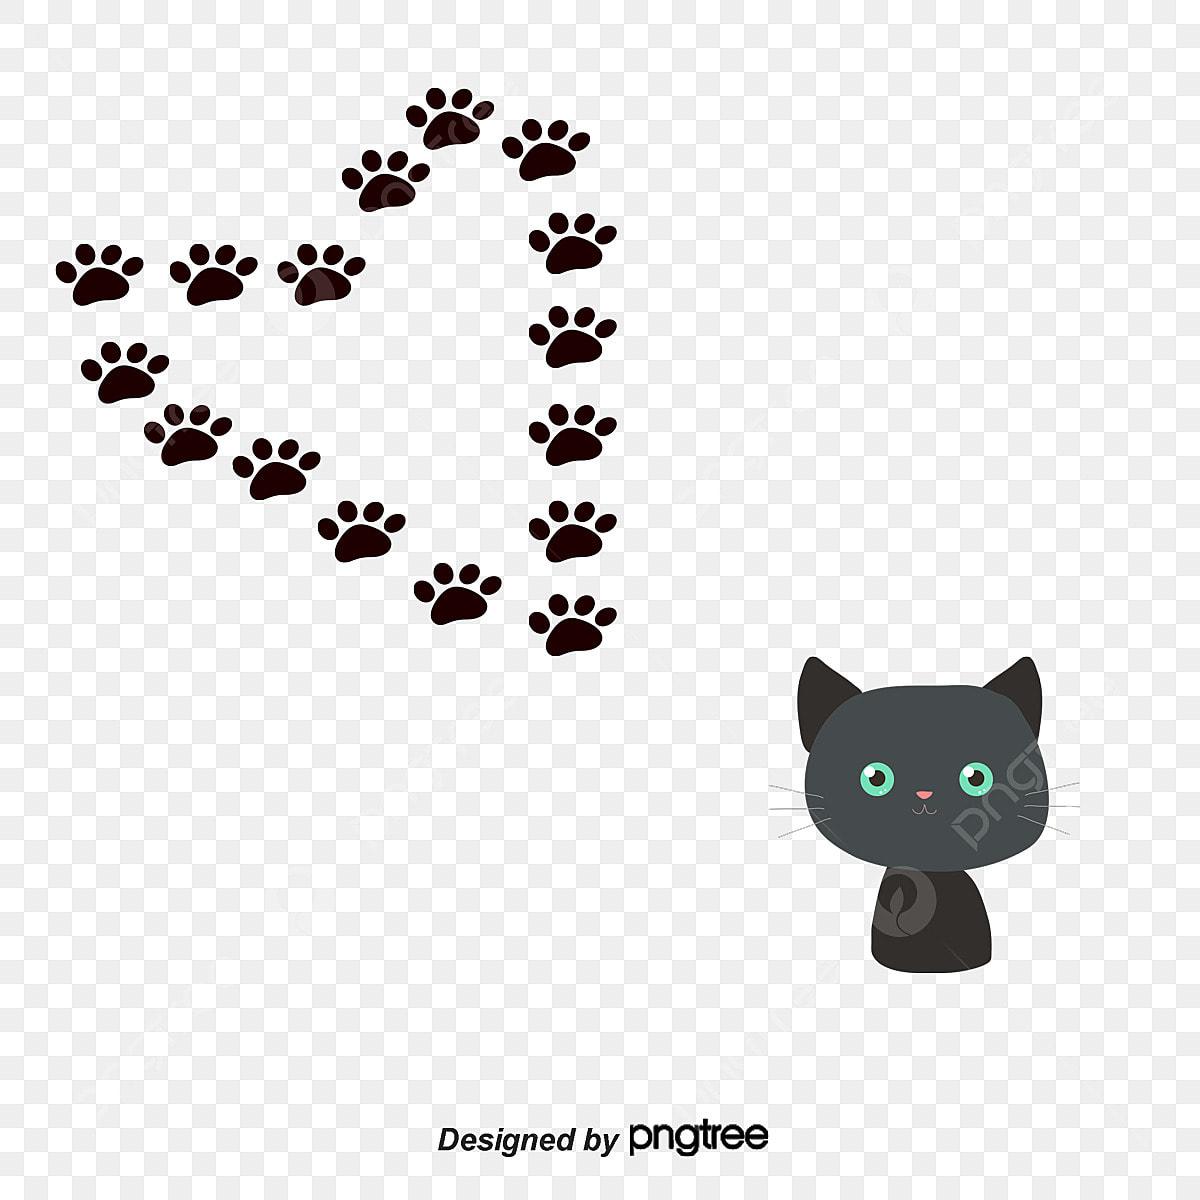 90 Gambar Binatang Kucing Kartun HD Terbaru